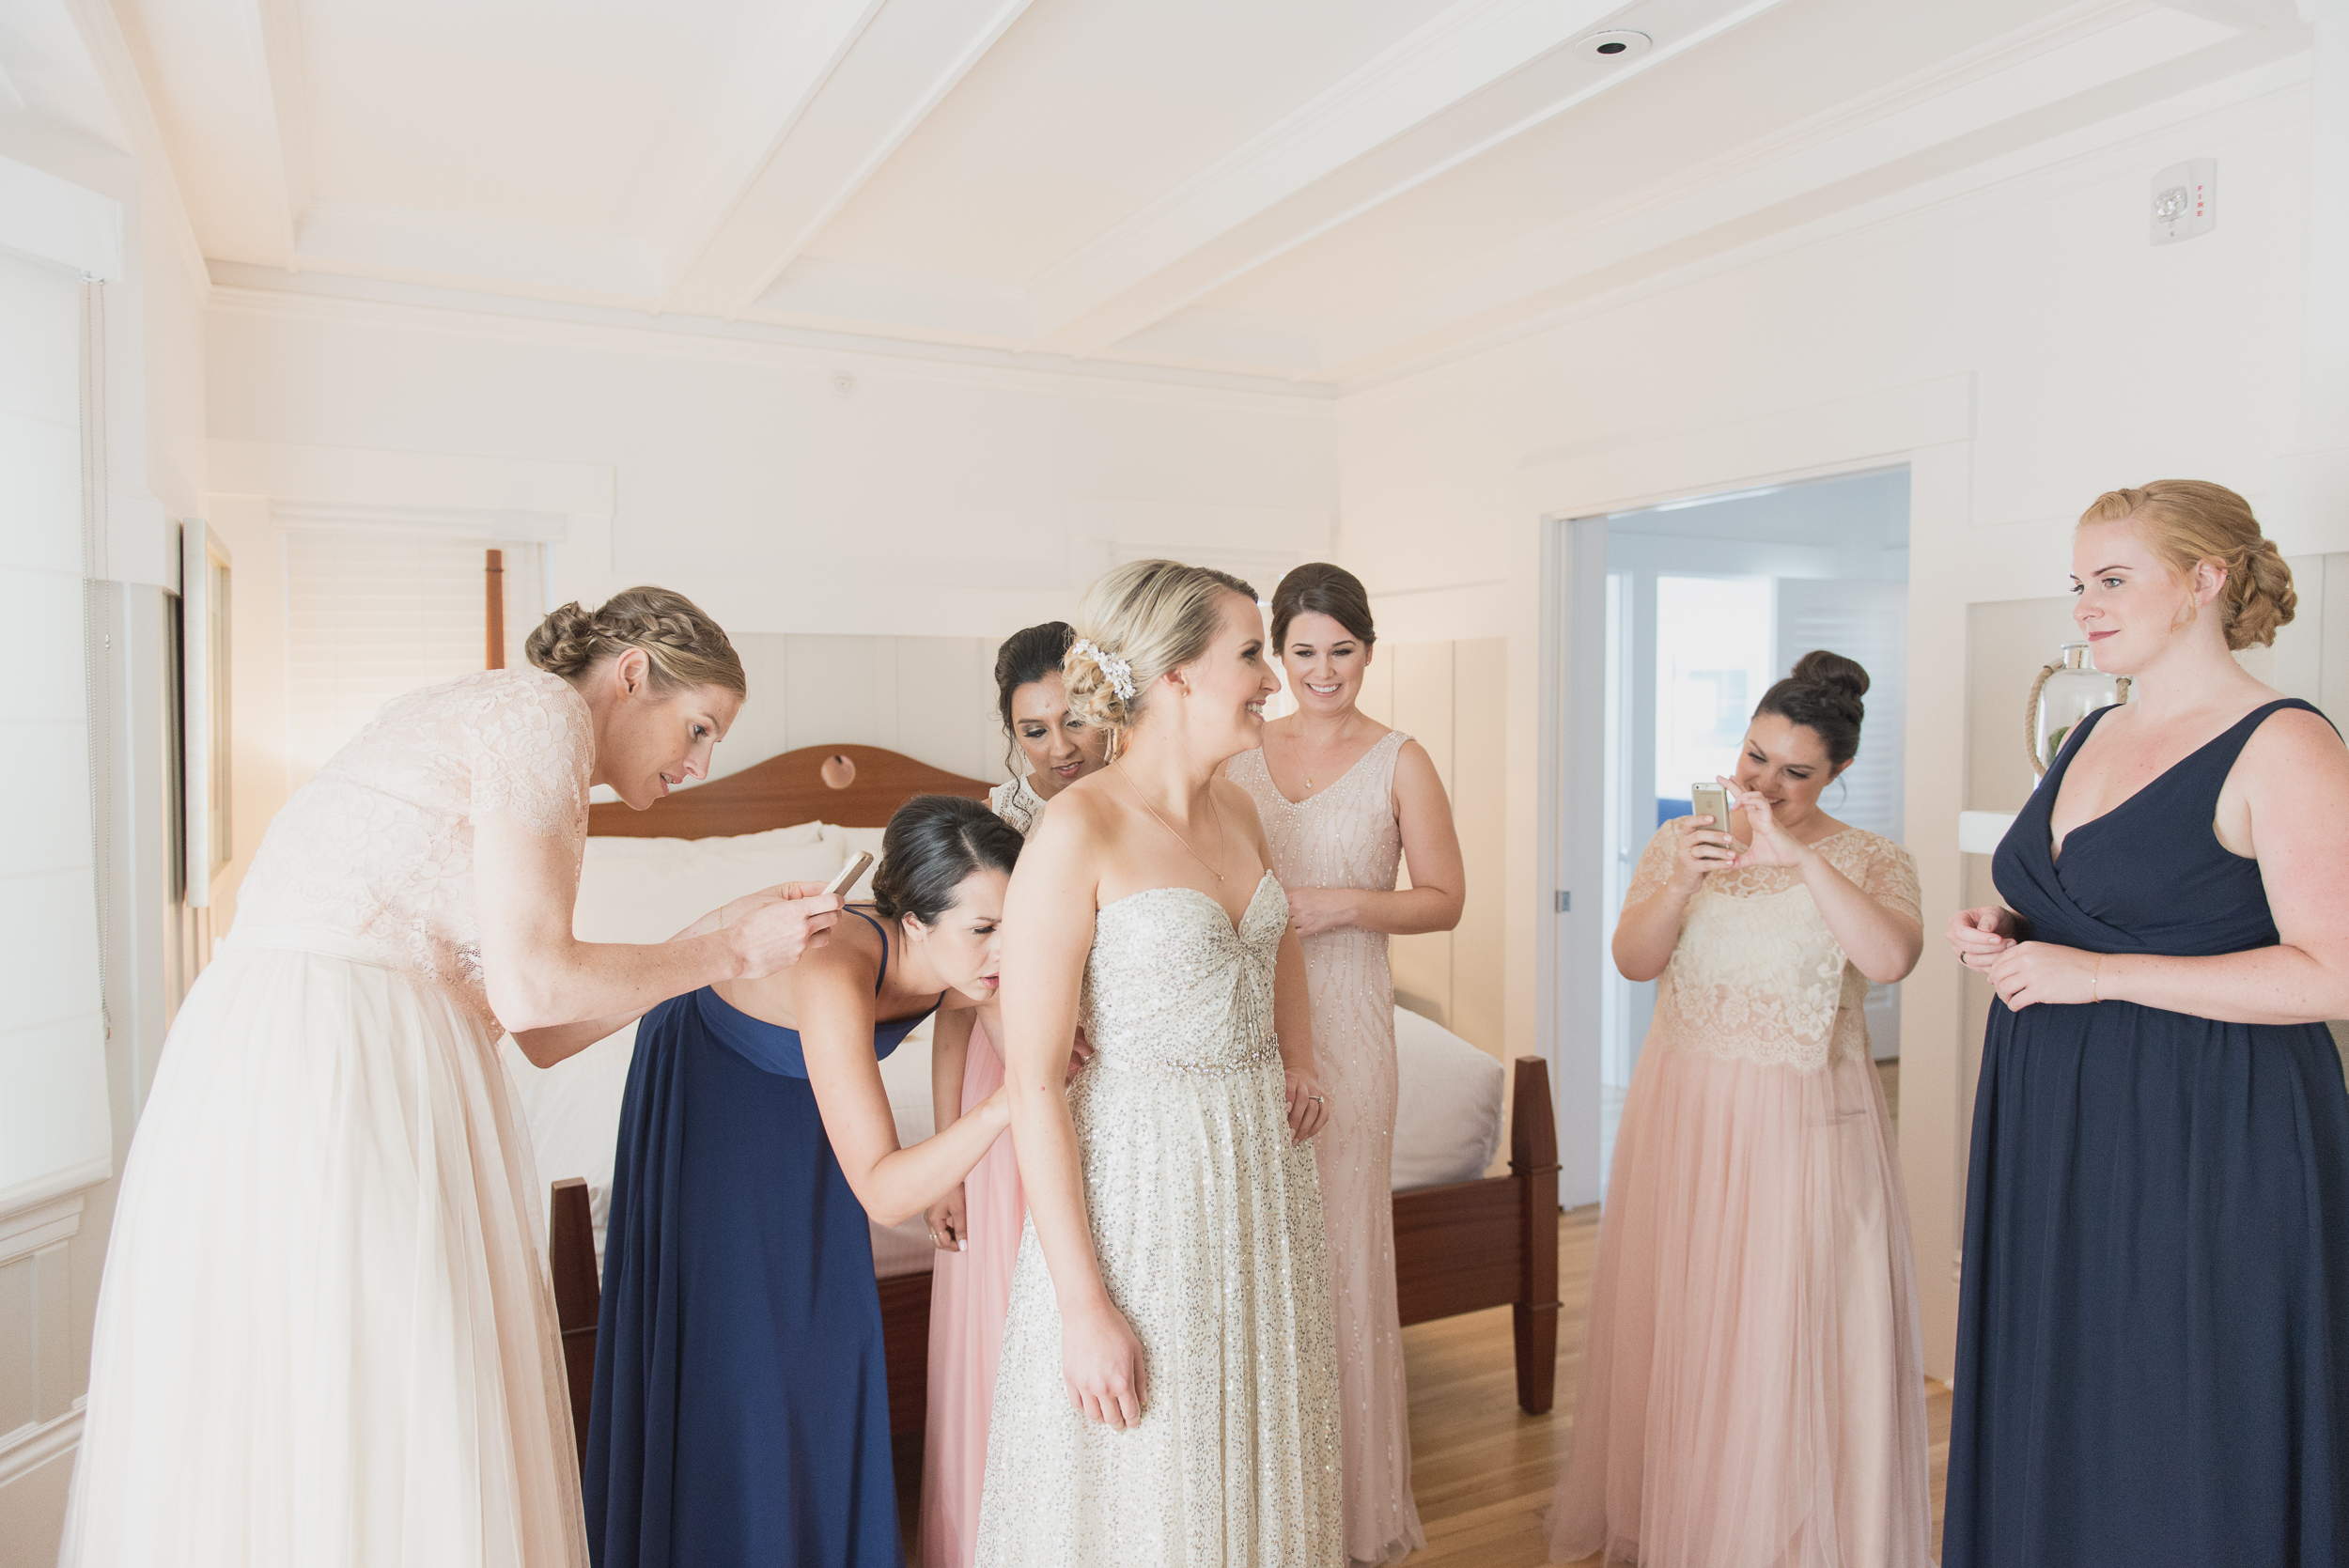 studio-333-sausalito-wedding-photographer-vc05.jpg